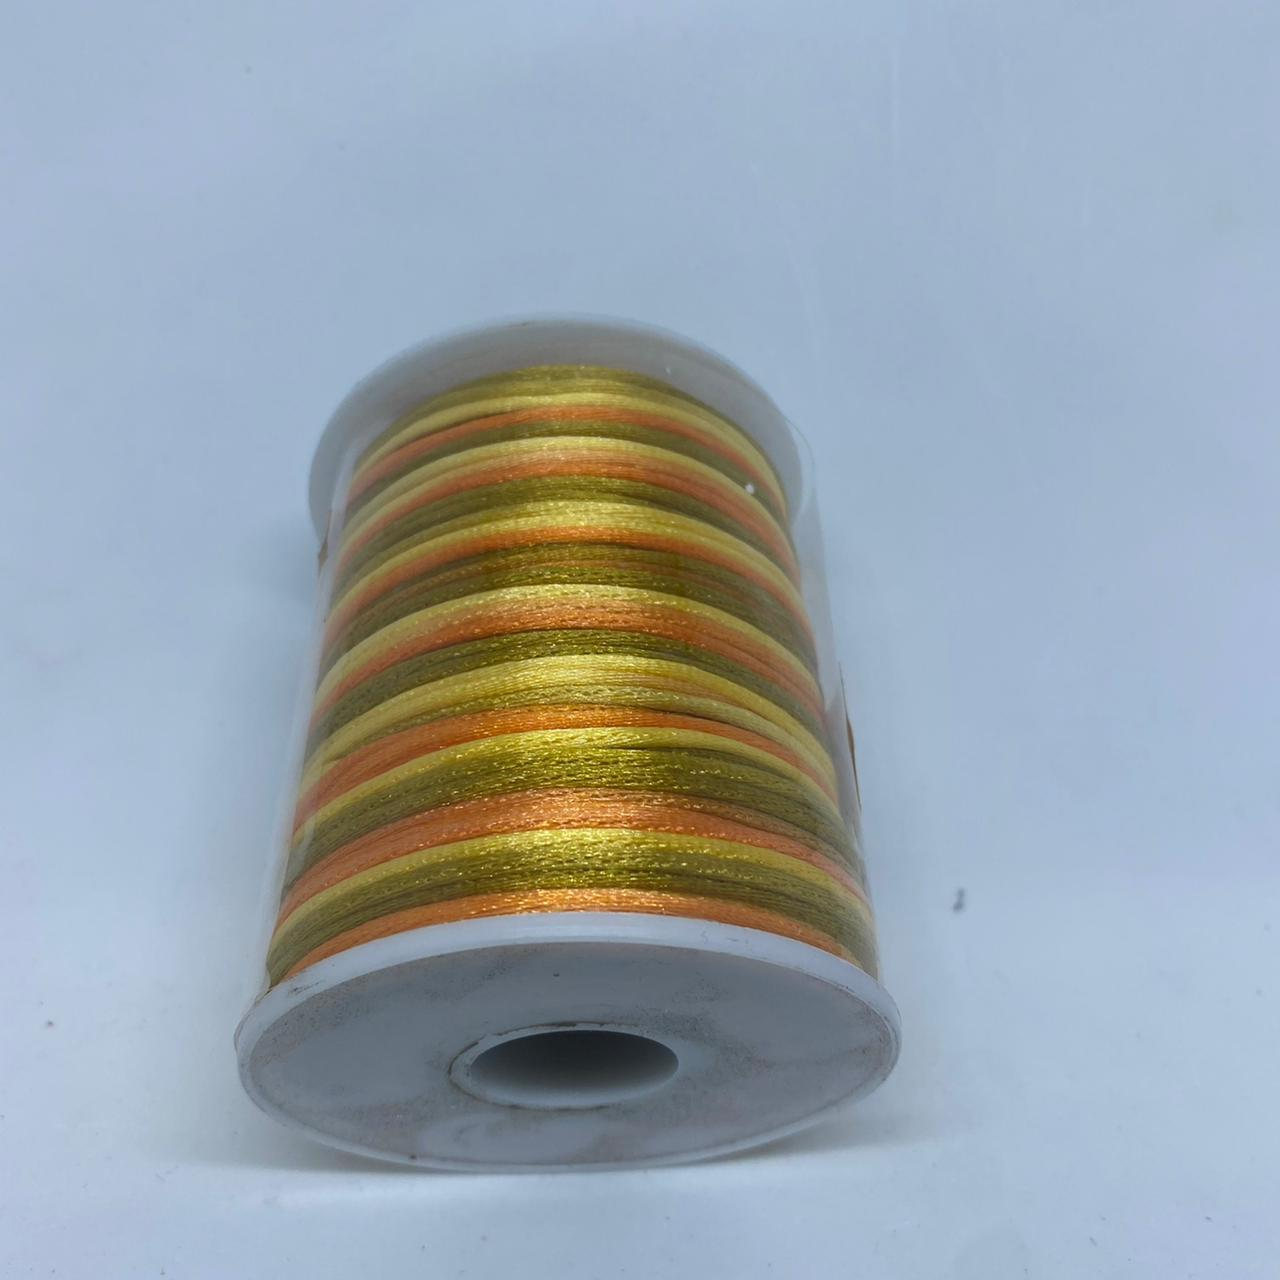 Fio de seda multicolorido (laranja, dourado , verde musgo)  c/ 10 metros 1.5mm